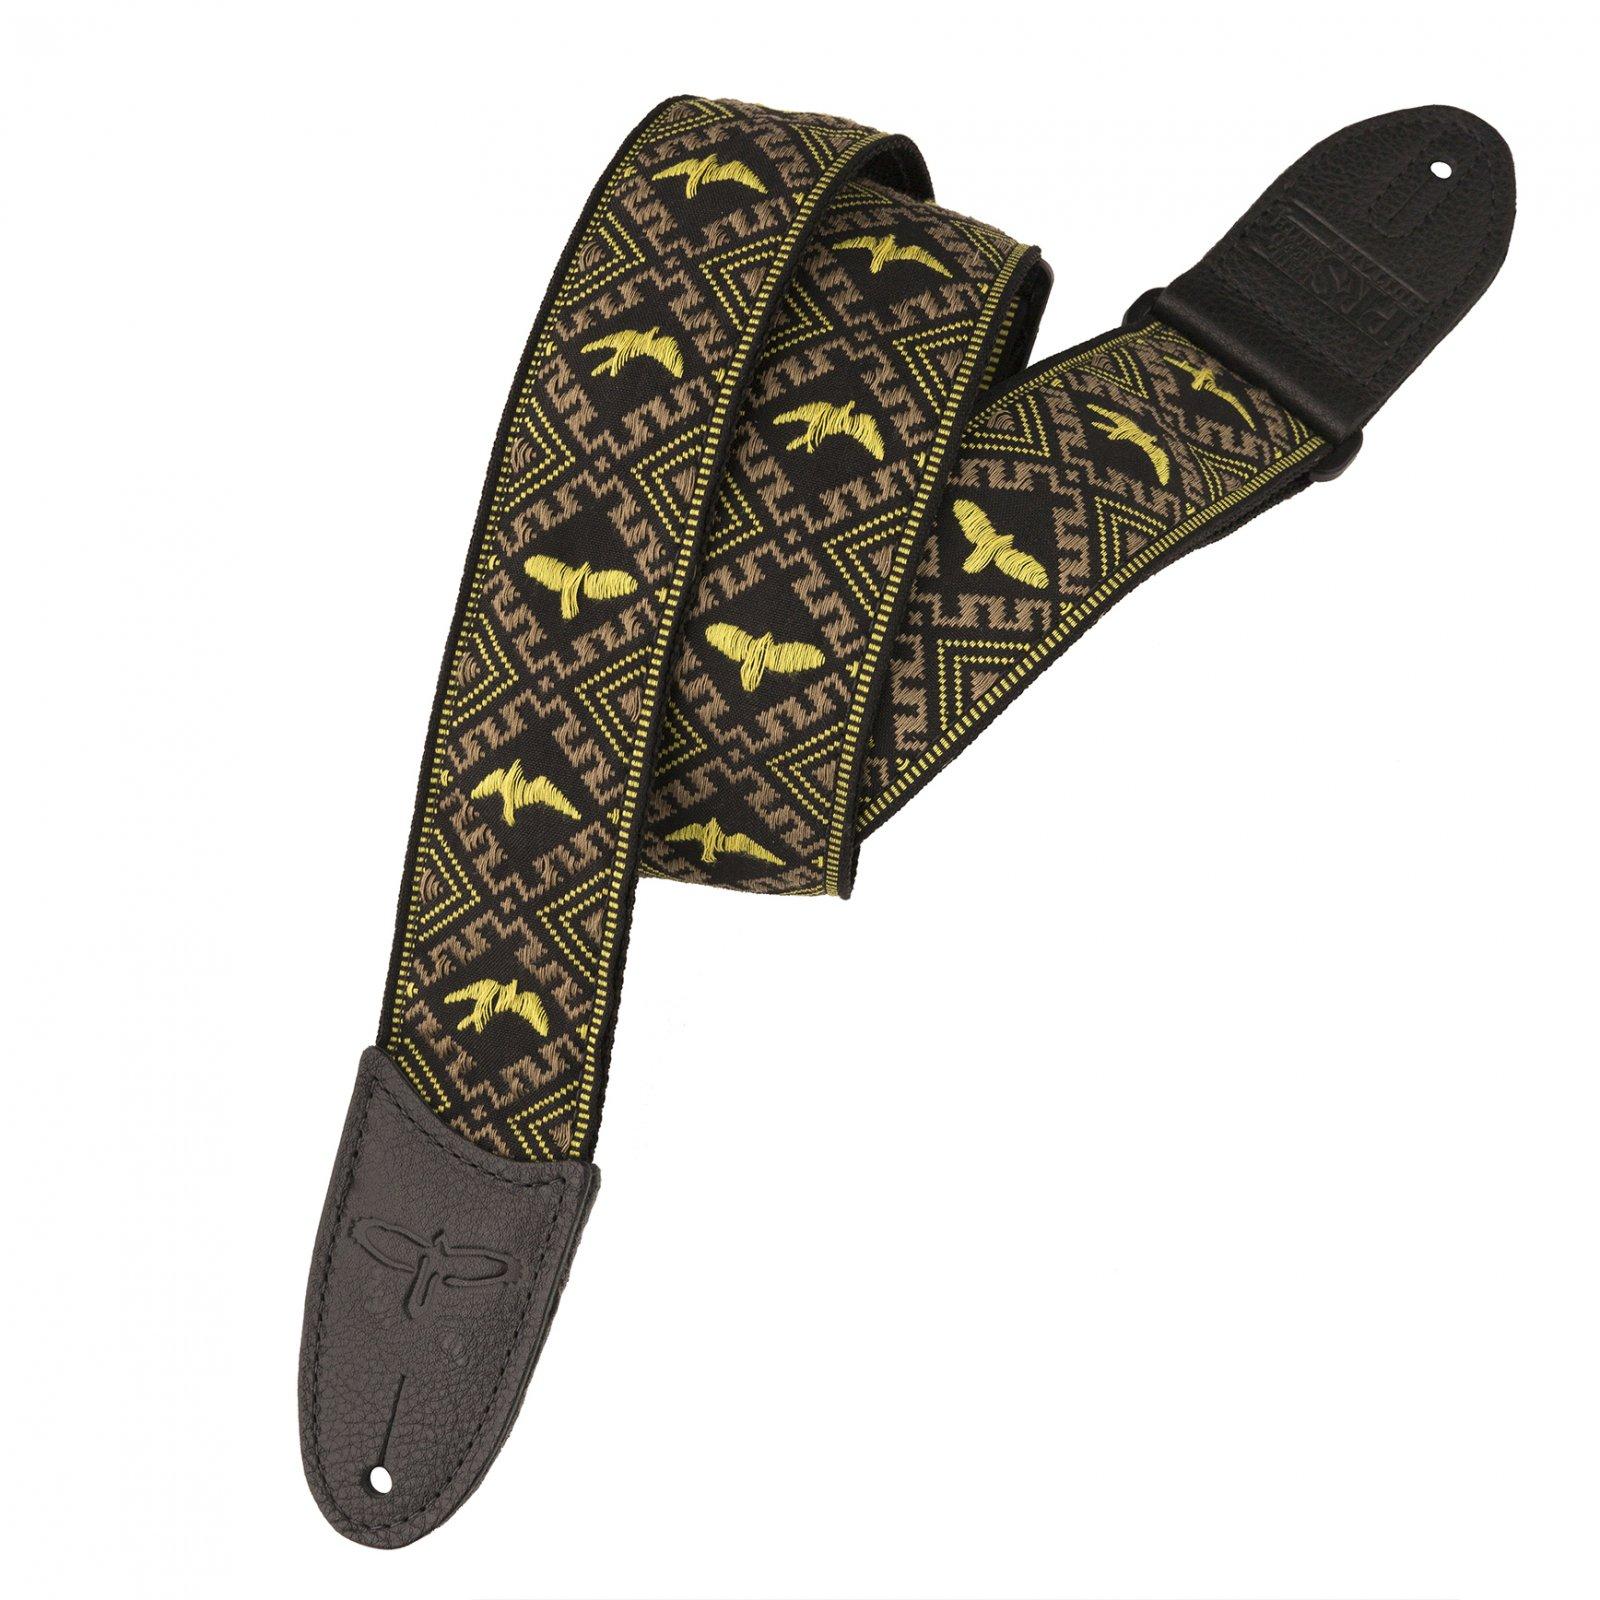 PRS Jacquard Hootenanny Style Guitar Strap, Yellow & Black Birds